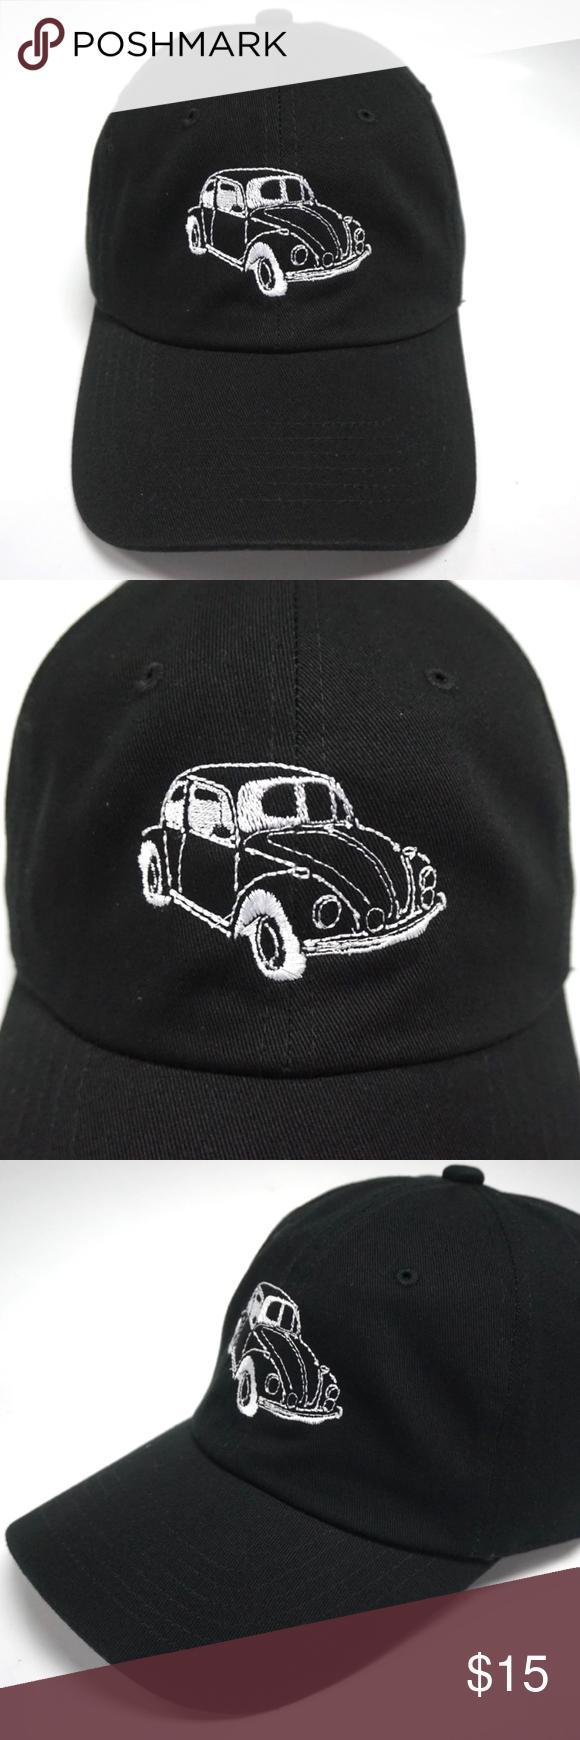 Volkswagen VW Bug Dad Hat Slouch Cap Volkswagen VW Bug Dad Hat Color  Black  Condition 5b2fdb1a113